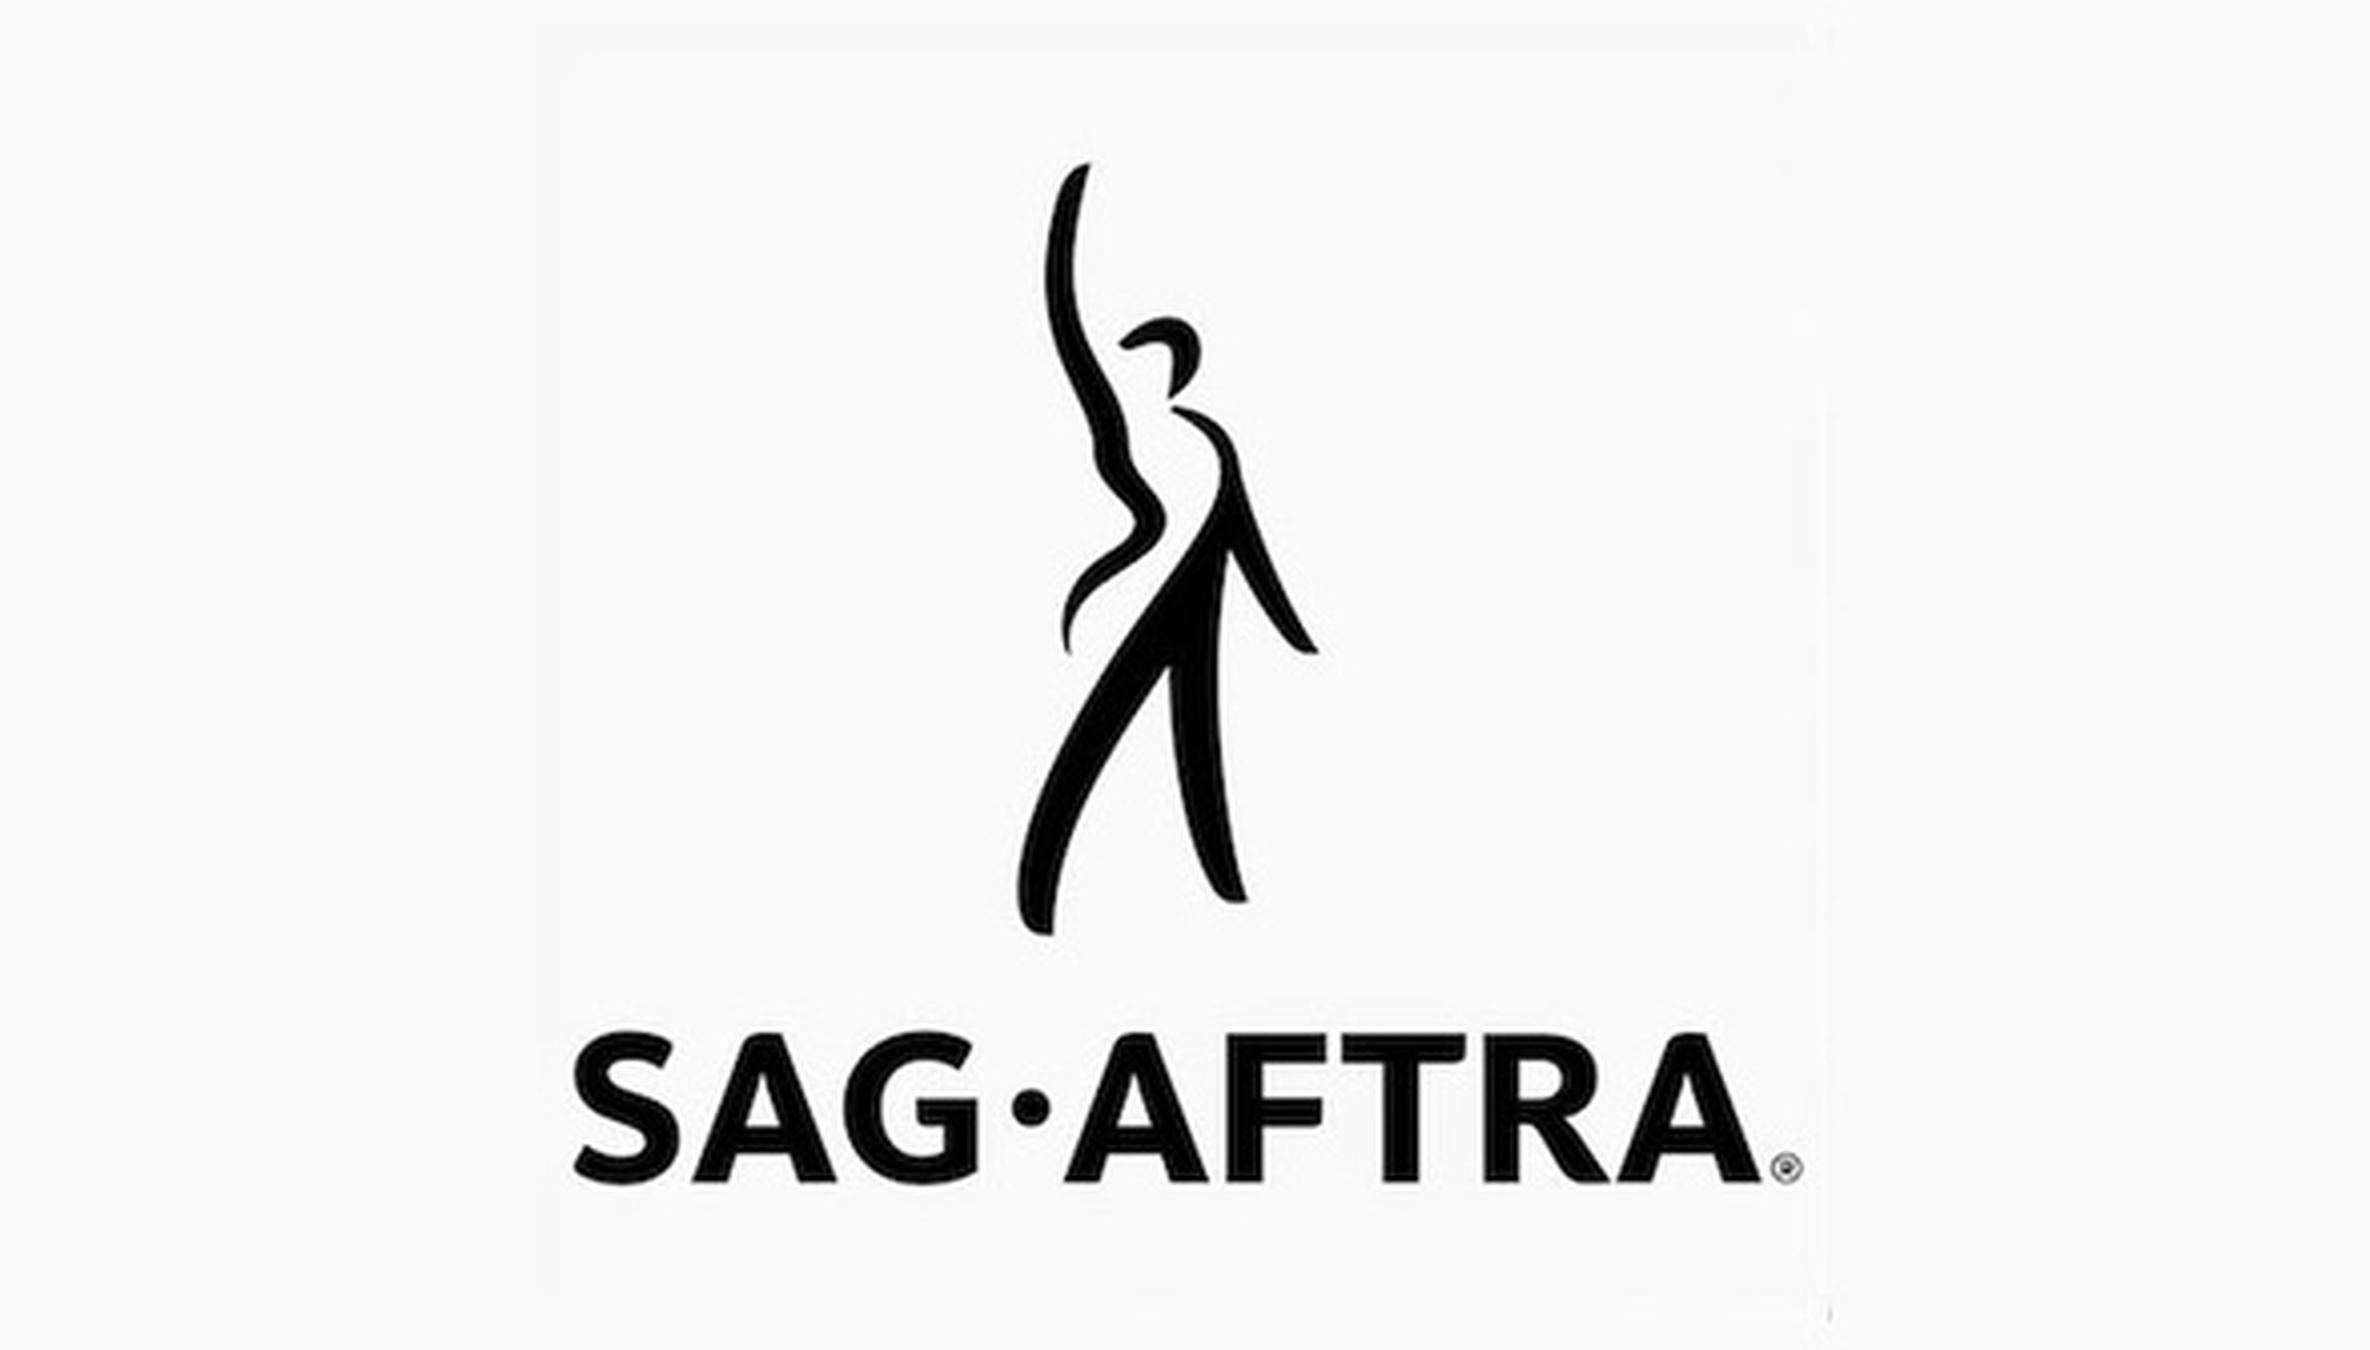 Sag Aftra Fcu >> How To Take Full Advantage Of Your Sag Aftra Membership